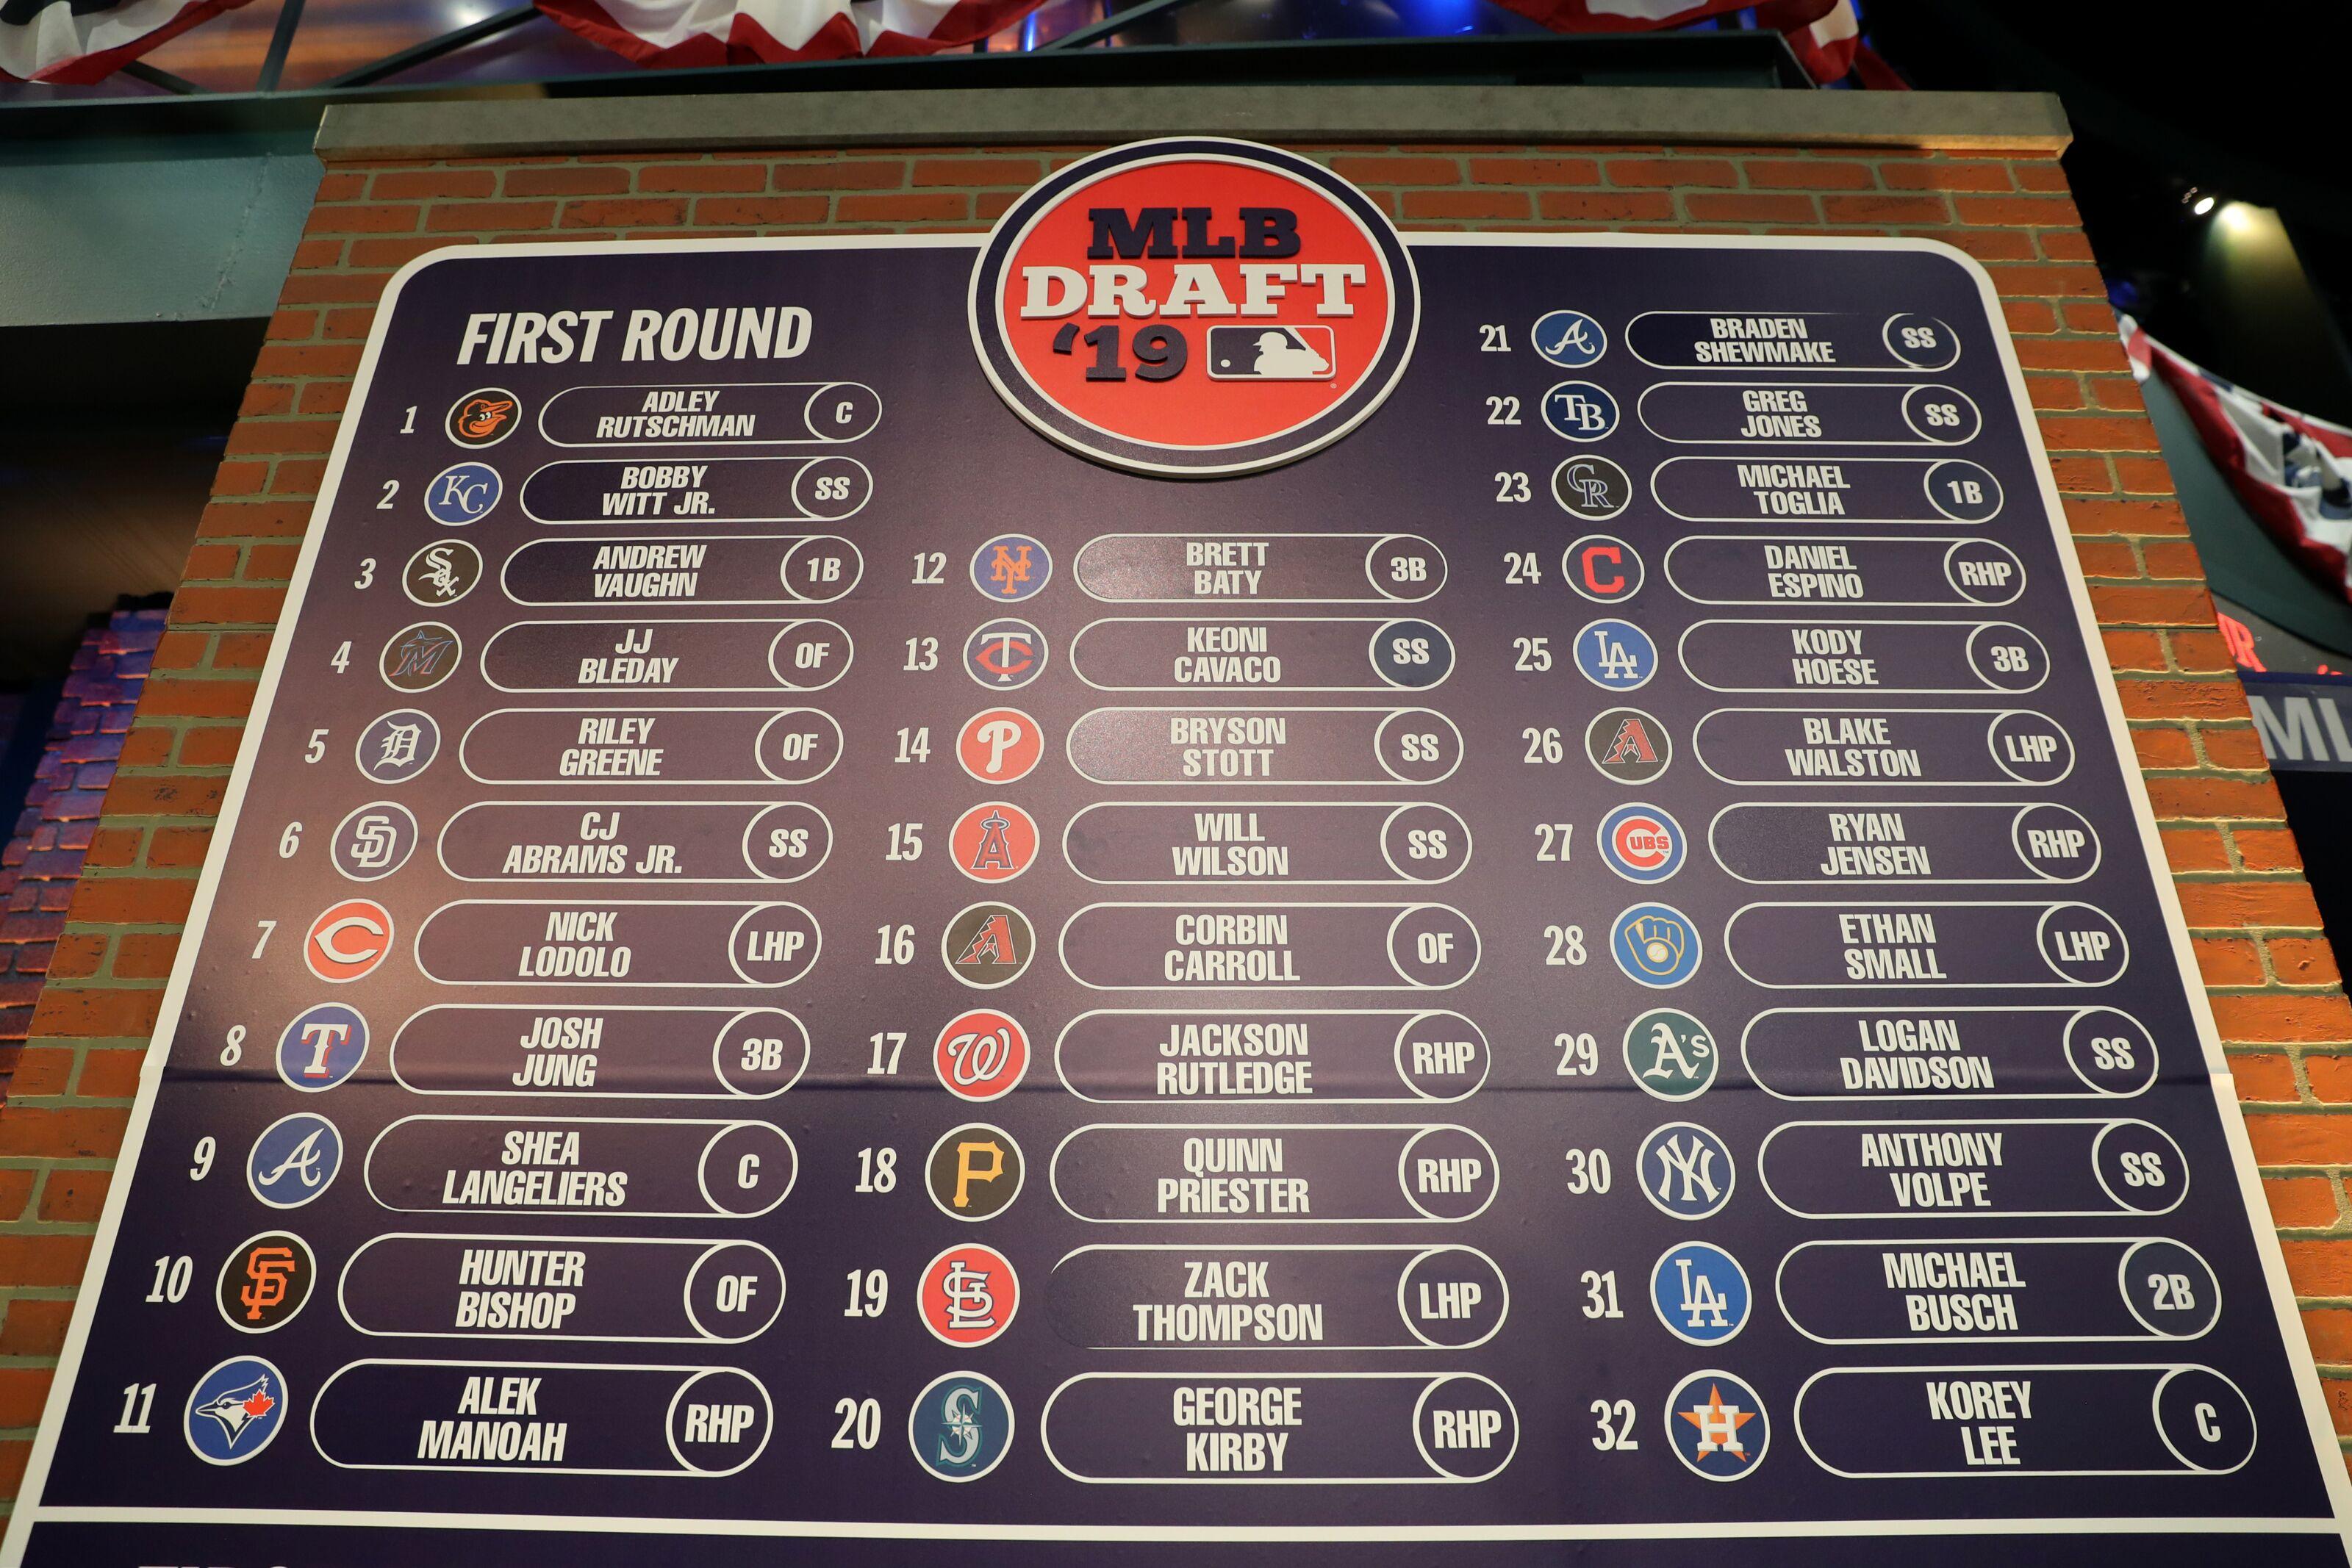 Top 3 Picks in 2019 MLB Draft Finish High in 2020 Prospect Rankings